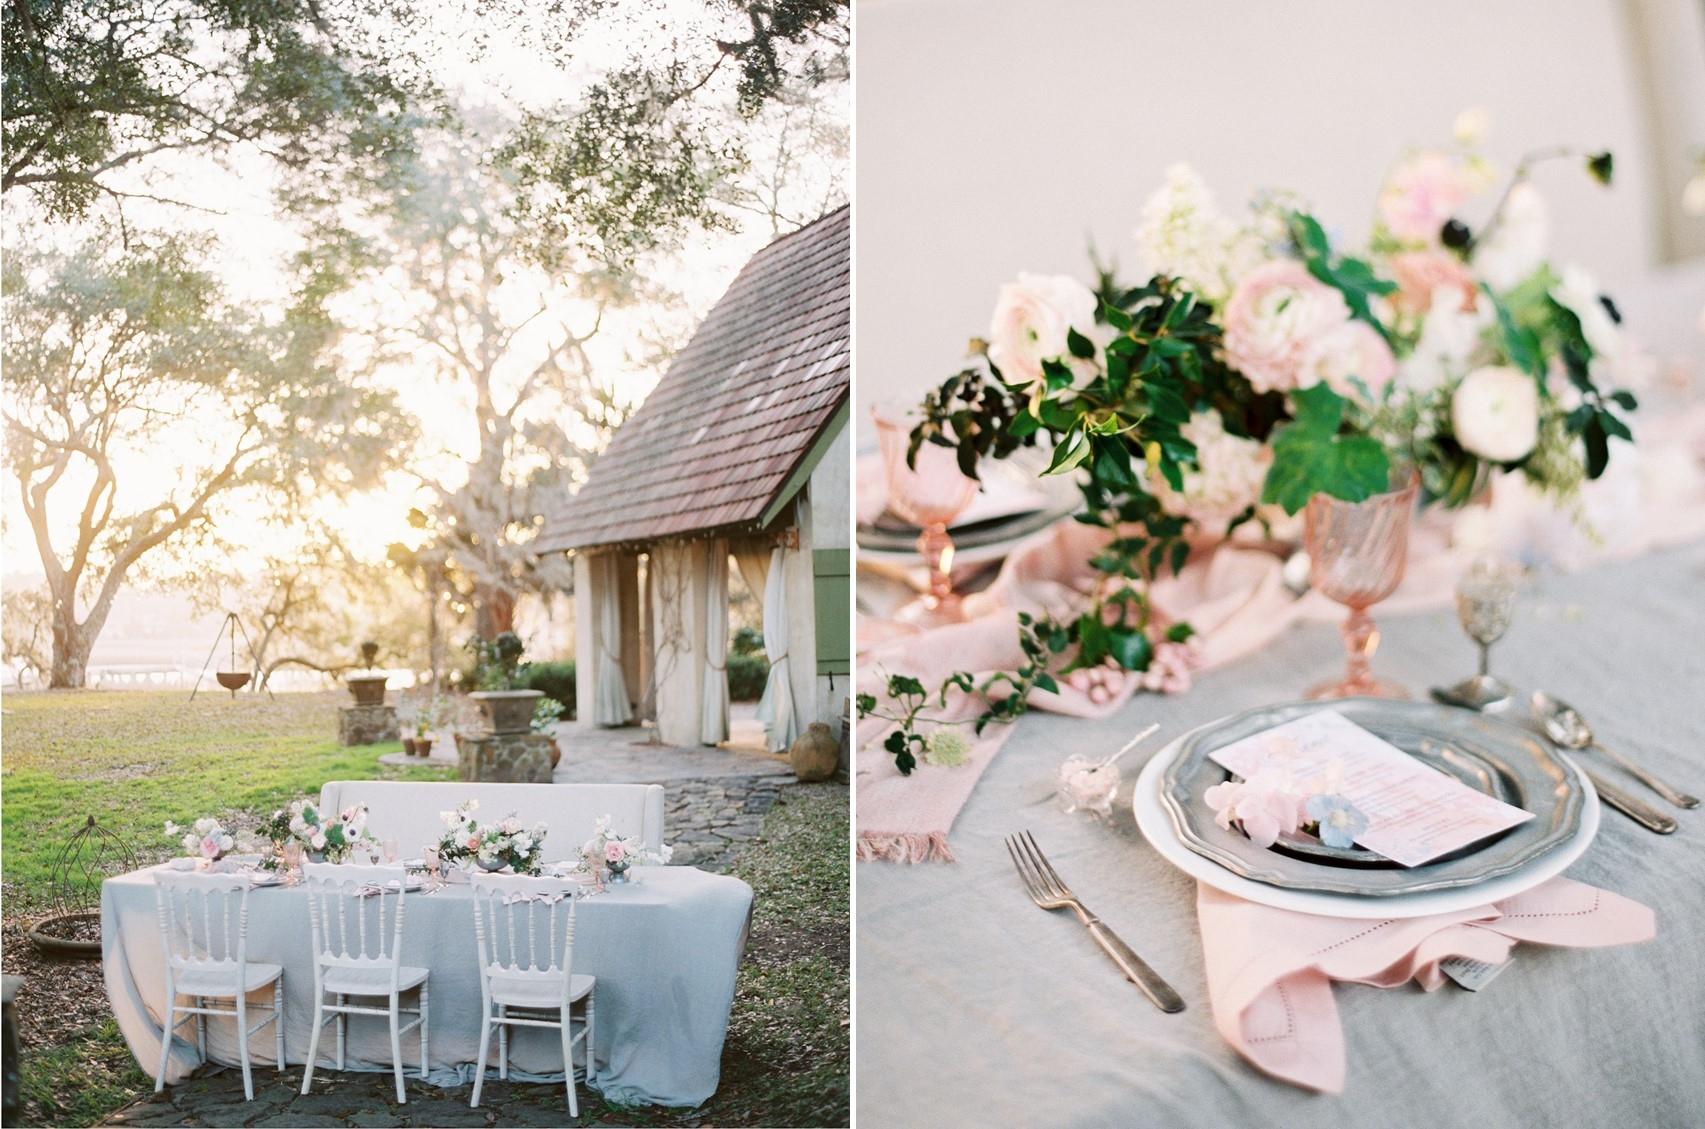 Serenity Blue & Rose Quartz Wedding Floral Centrepiece \\ Photography - Charla Storey